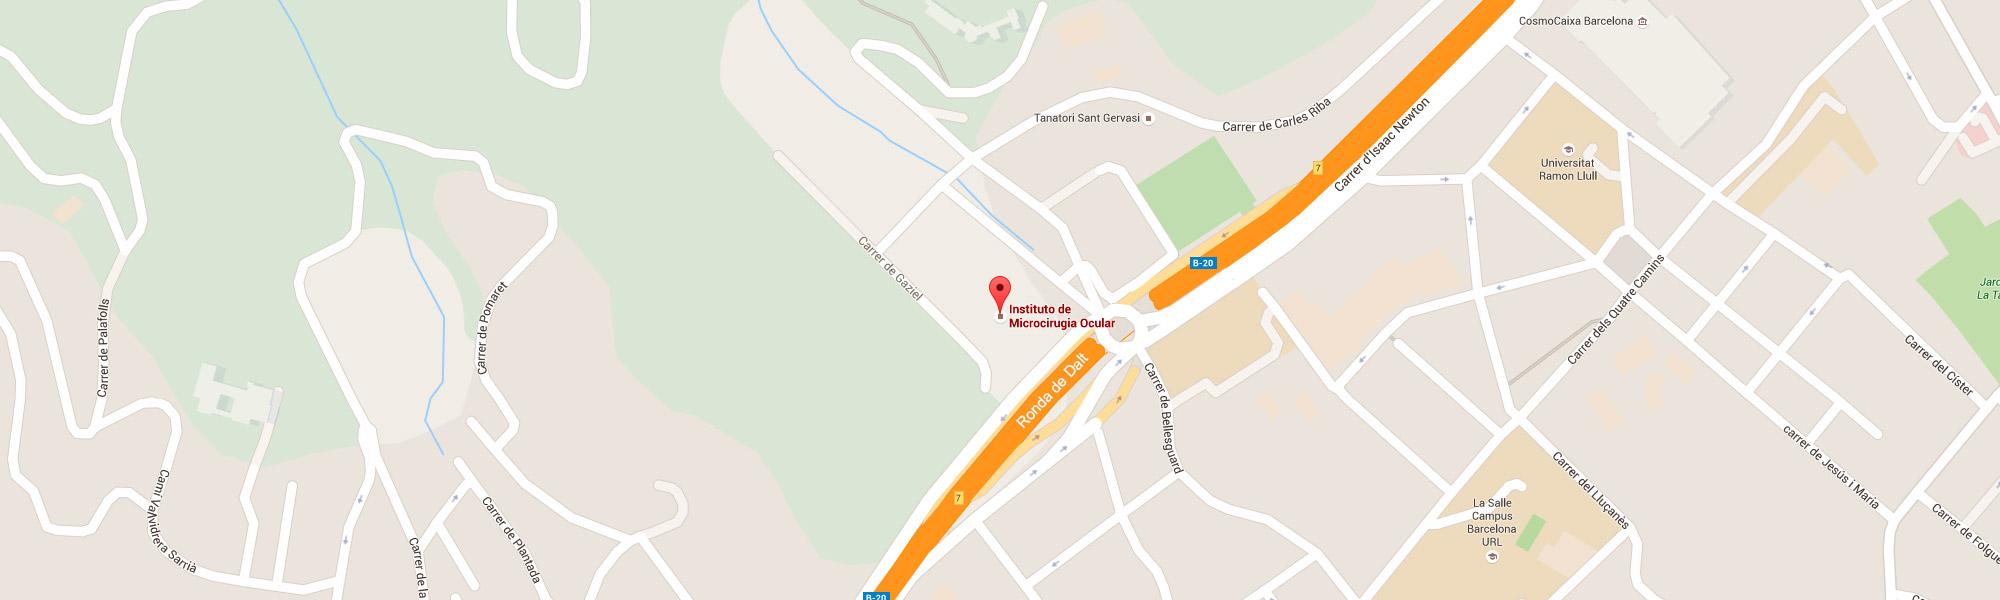 Institut de Microcirurgia Ocular google maps